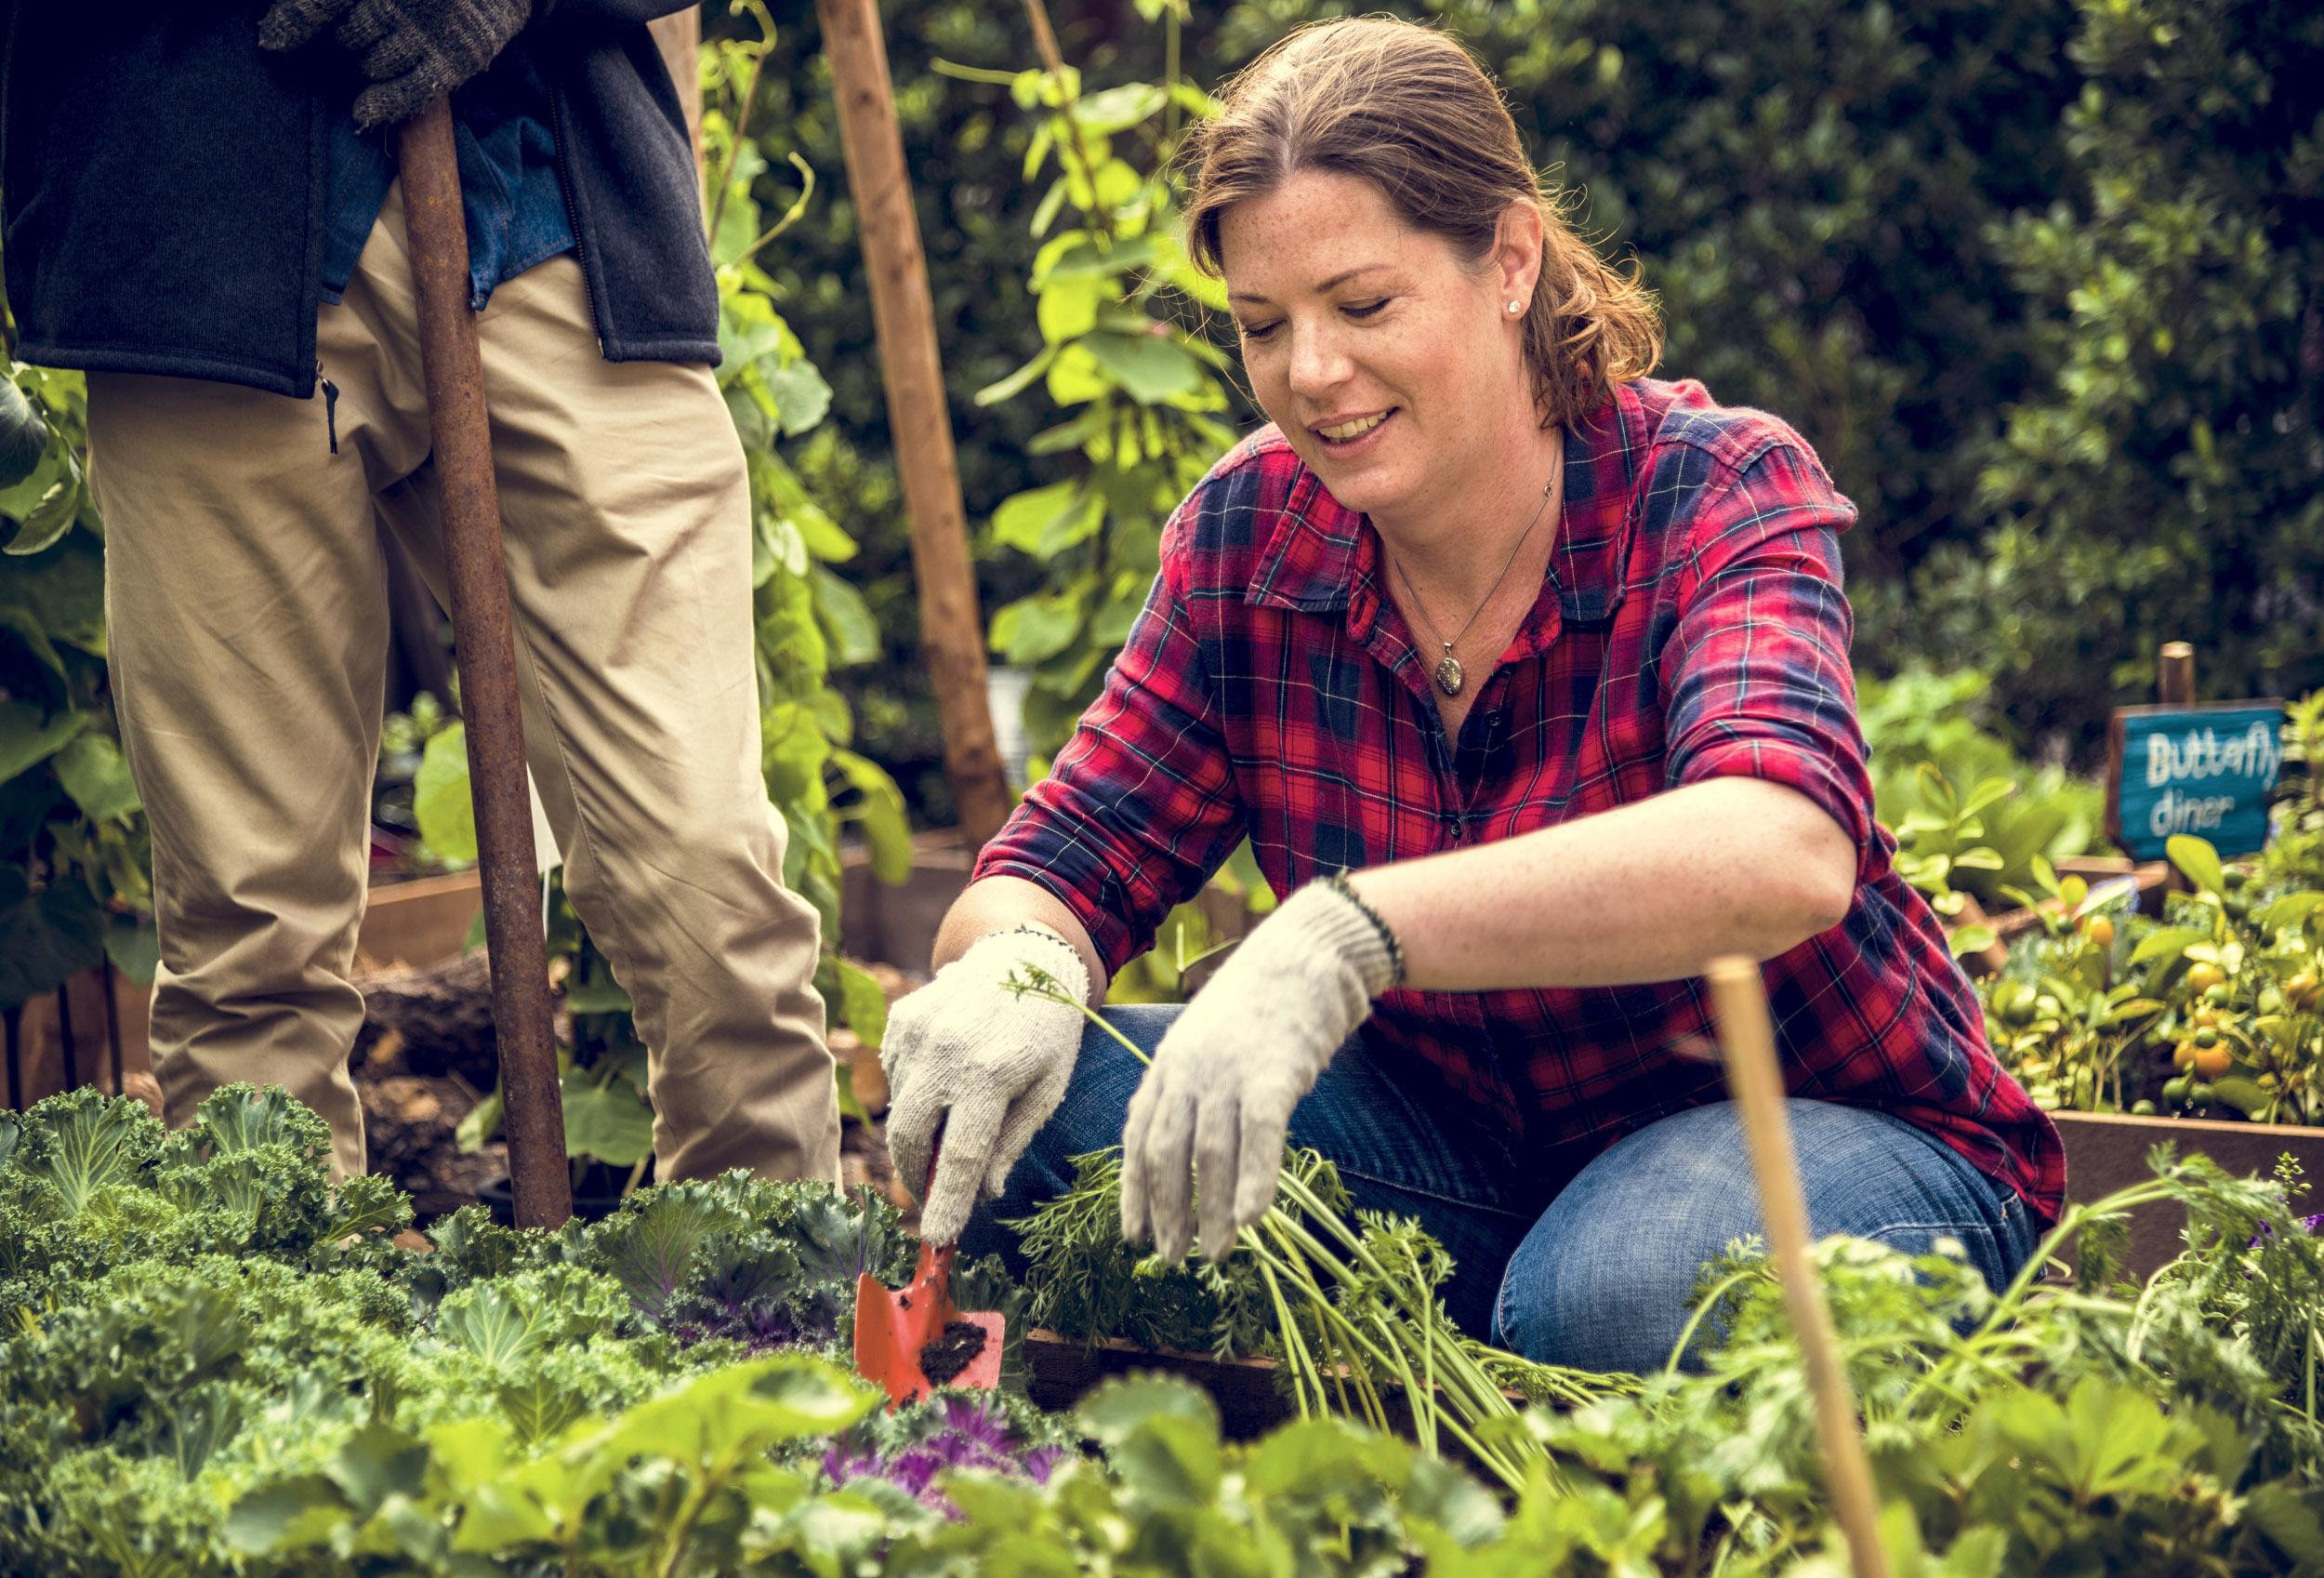 Woman farmer gardening at countryside